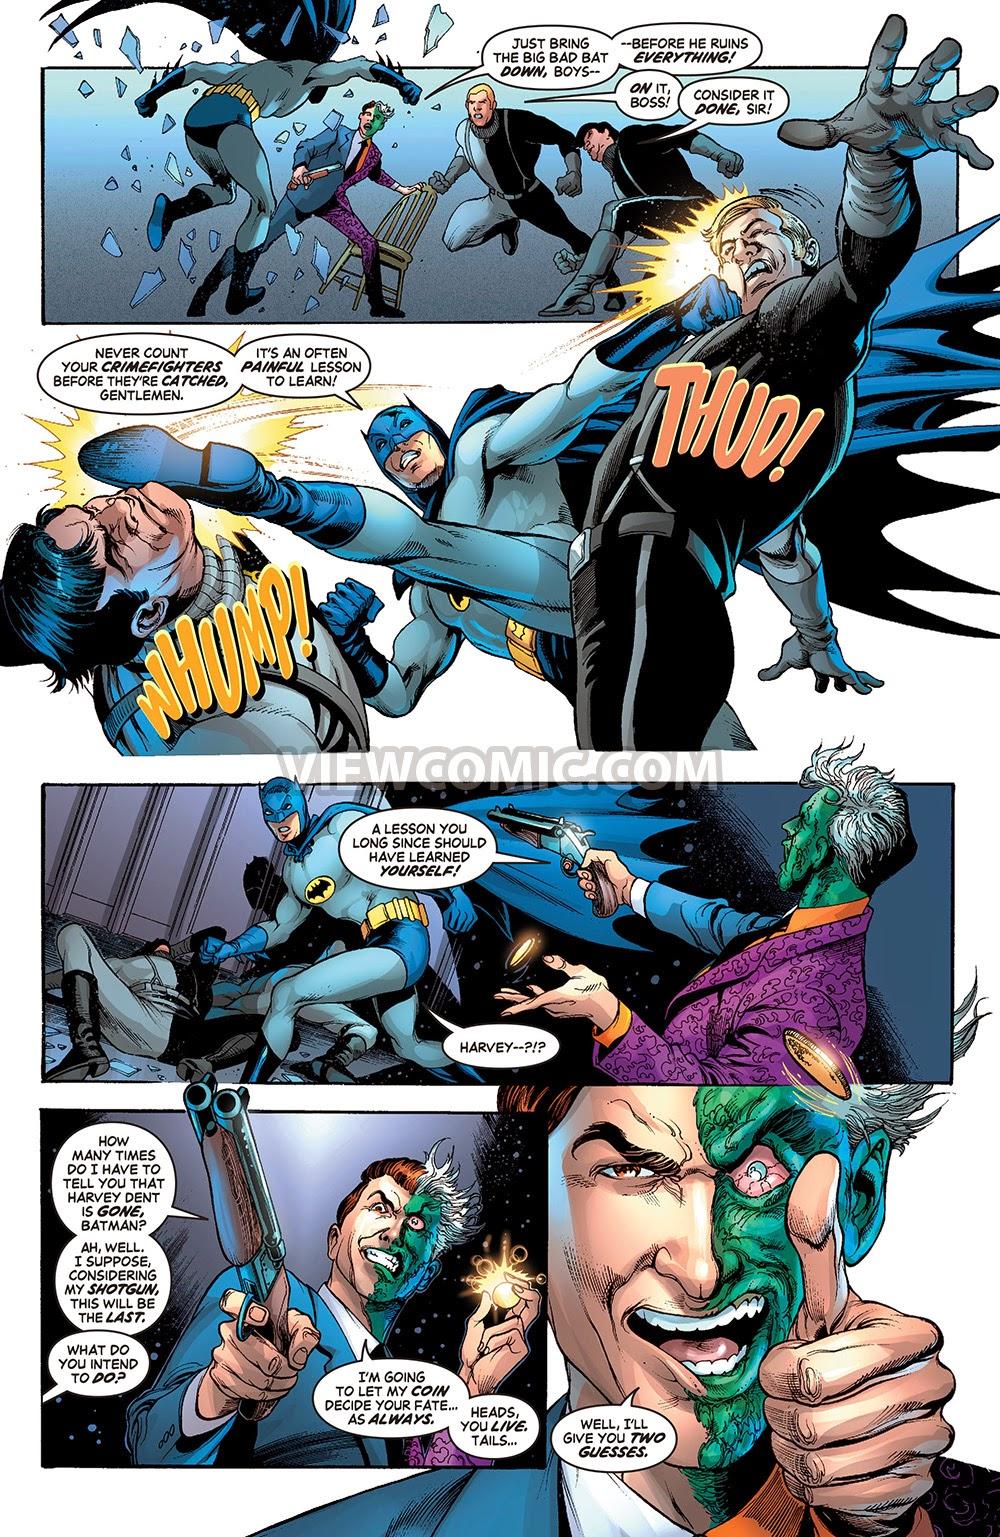 batman 66 the lost episode 001 2015 viewcomic reading